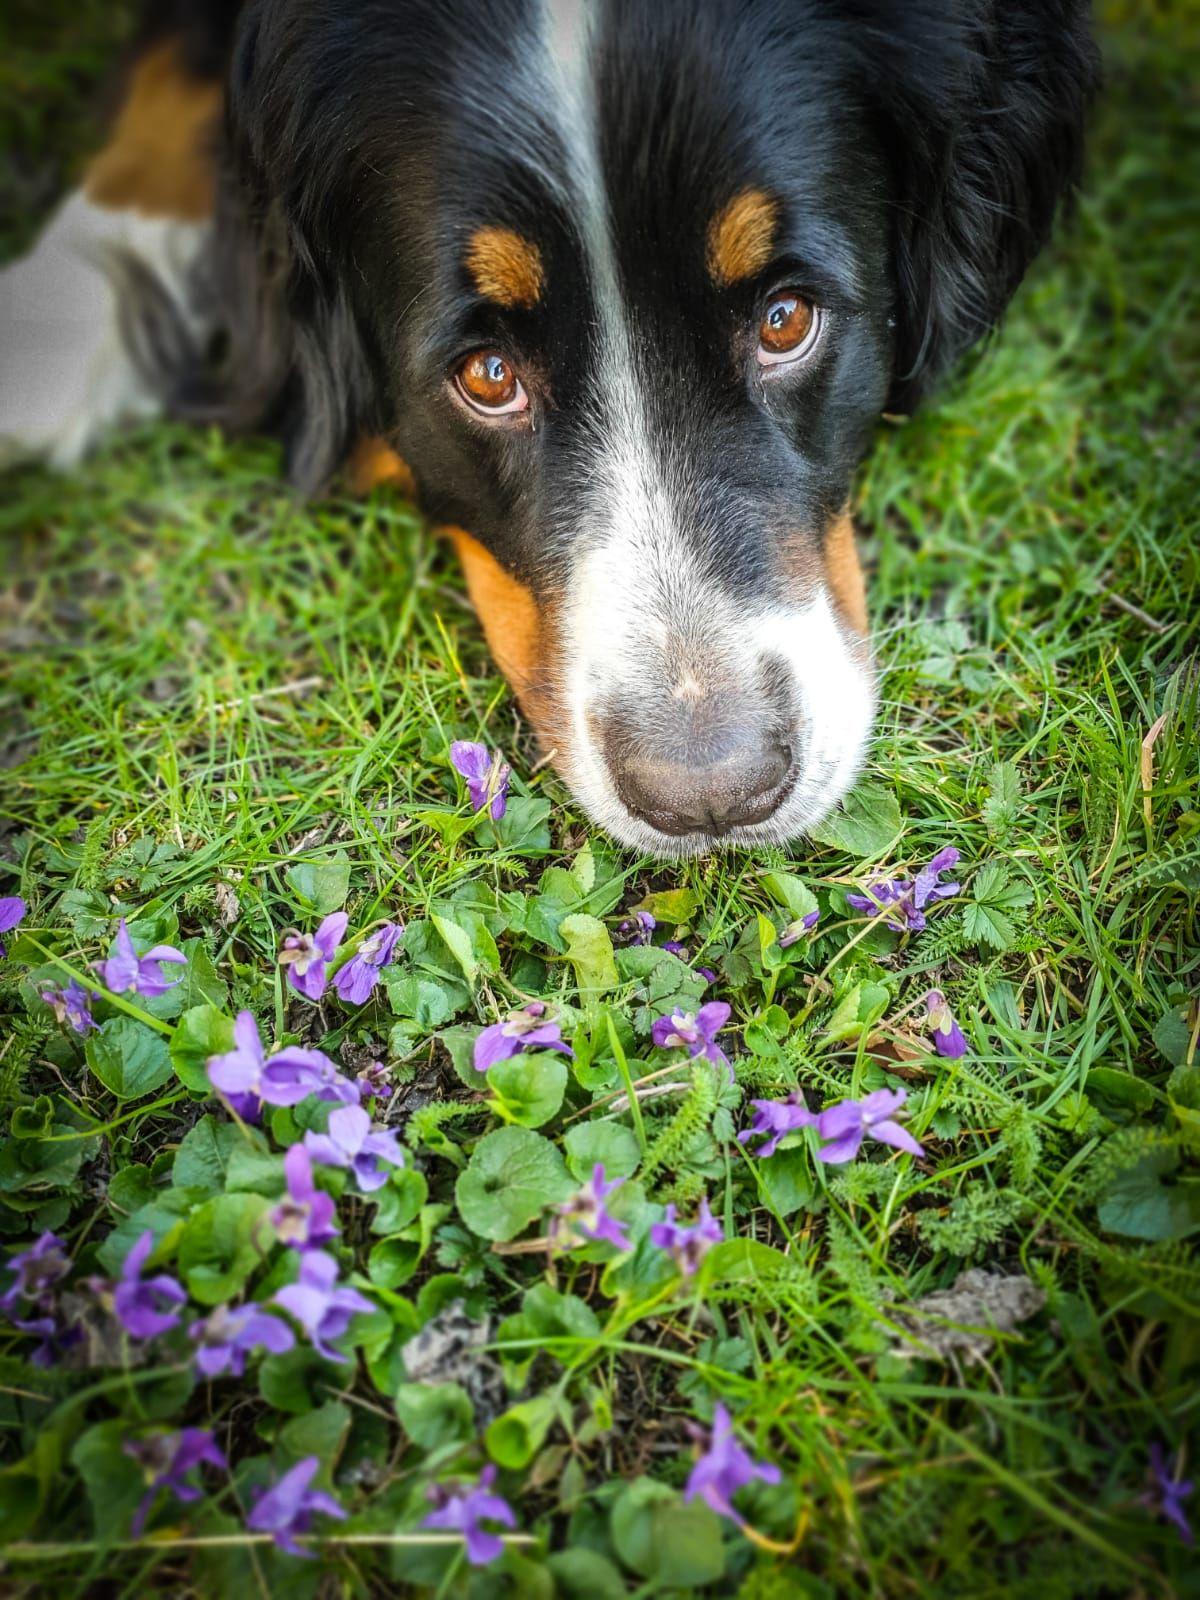 Sunny Von Bayern In 2020 Berner Sennenhund Sennenhund Hunde